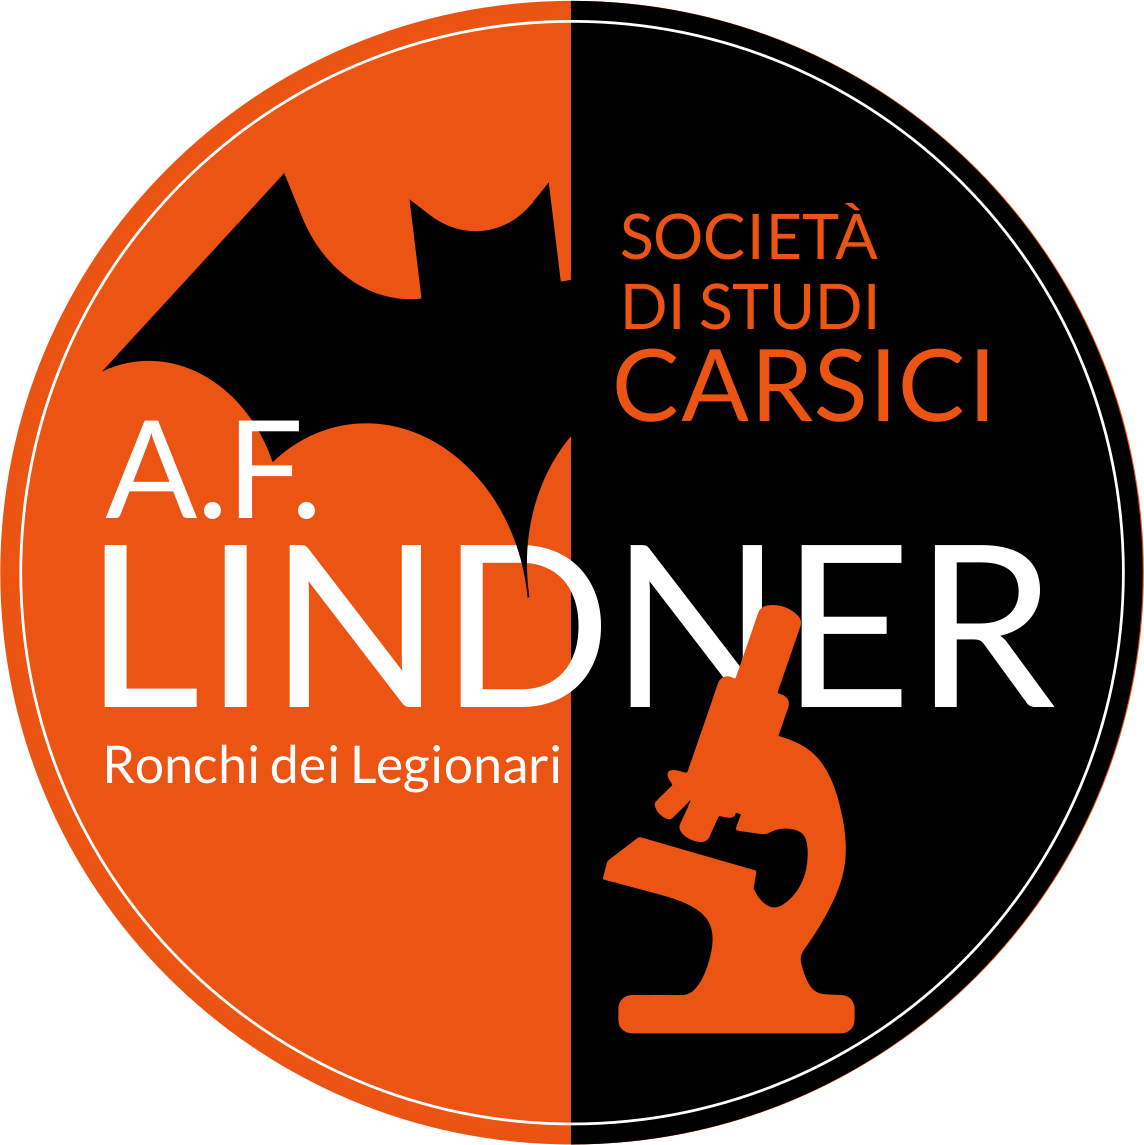 Società di Studi Carsici A.F. Lindner